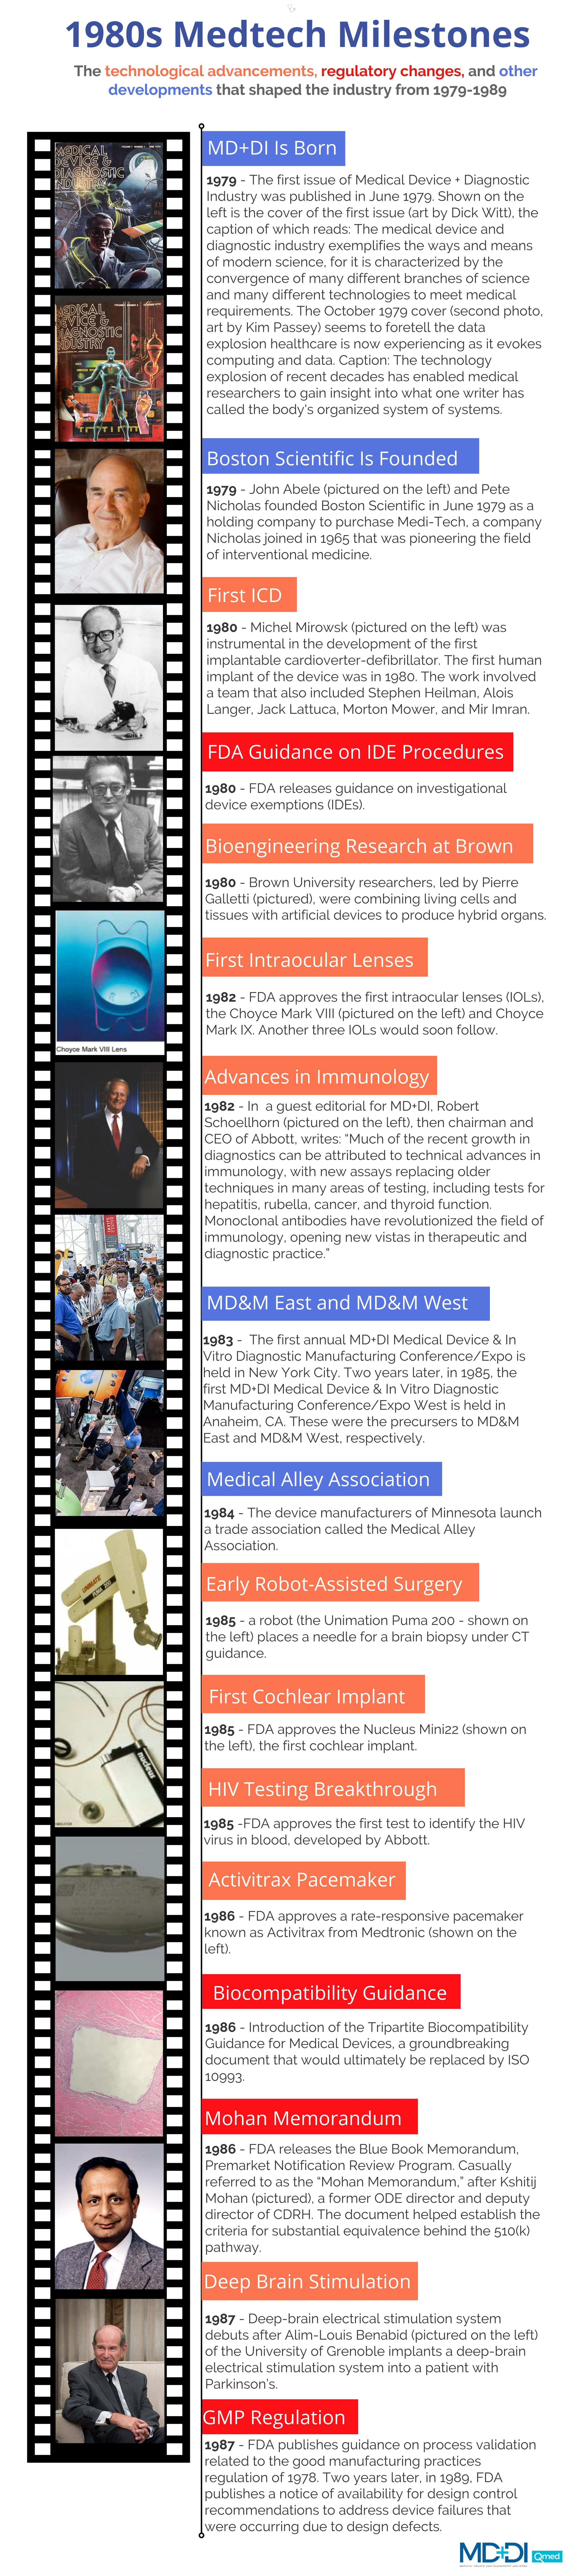 Celebrating 40 Years: 1980s Medtech Milestones | MDDI Online